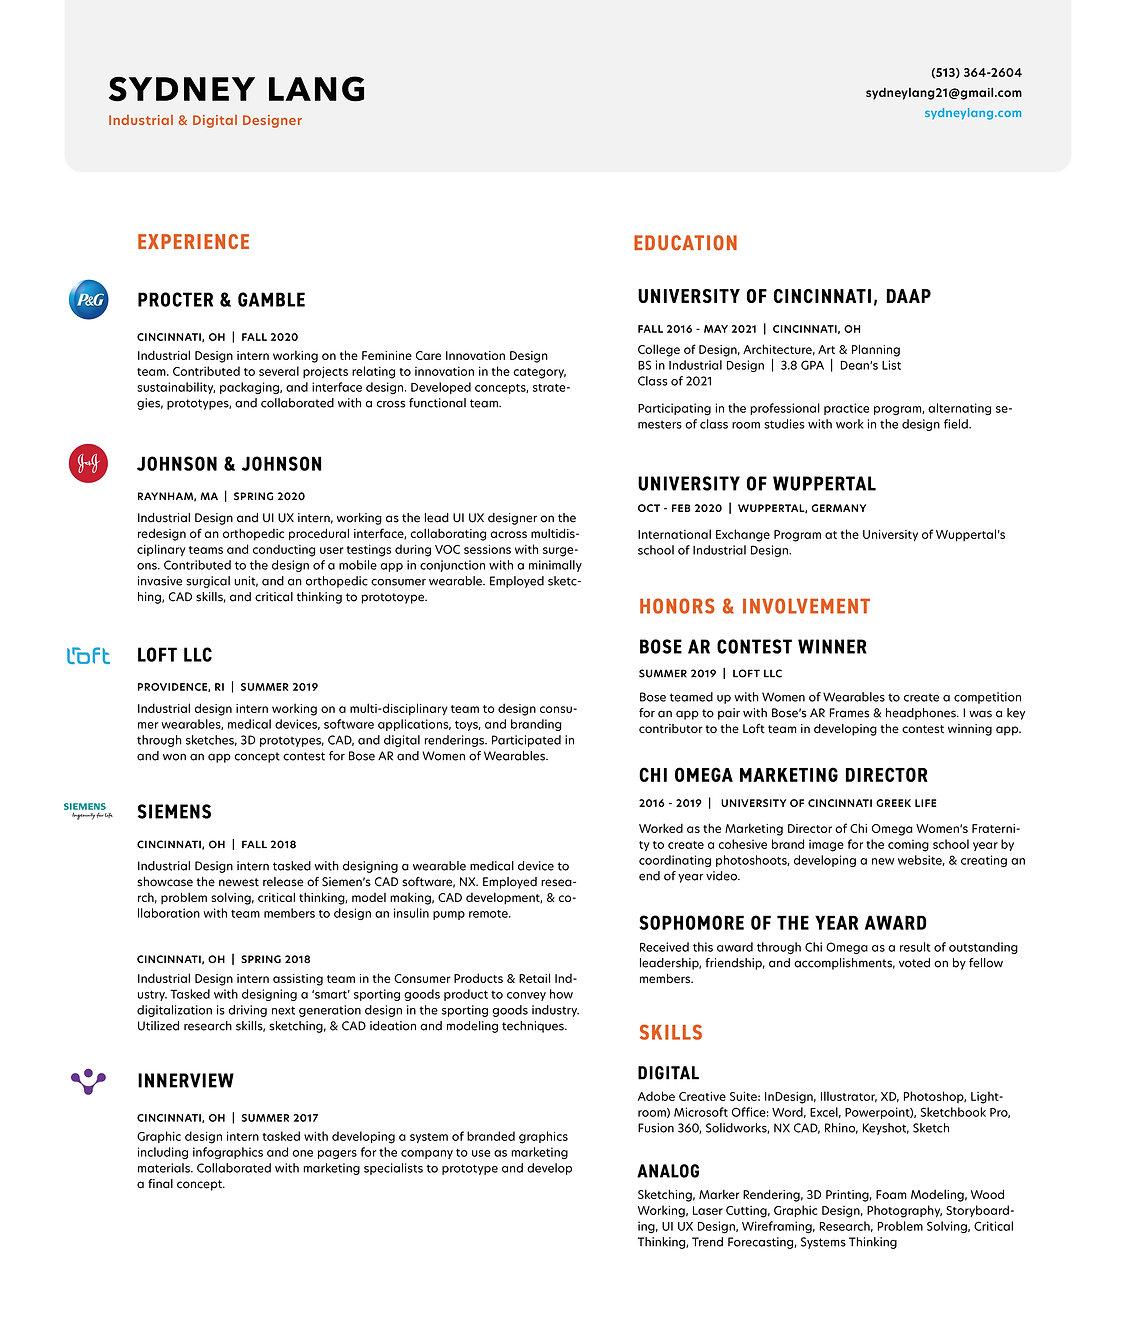 resume website.jpg